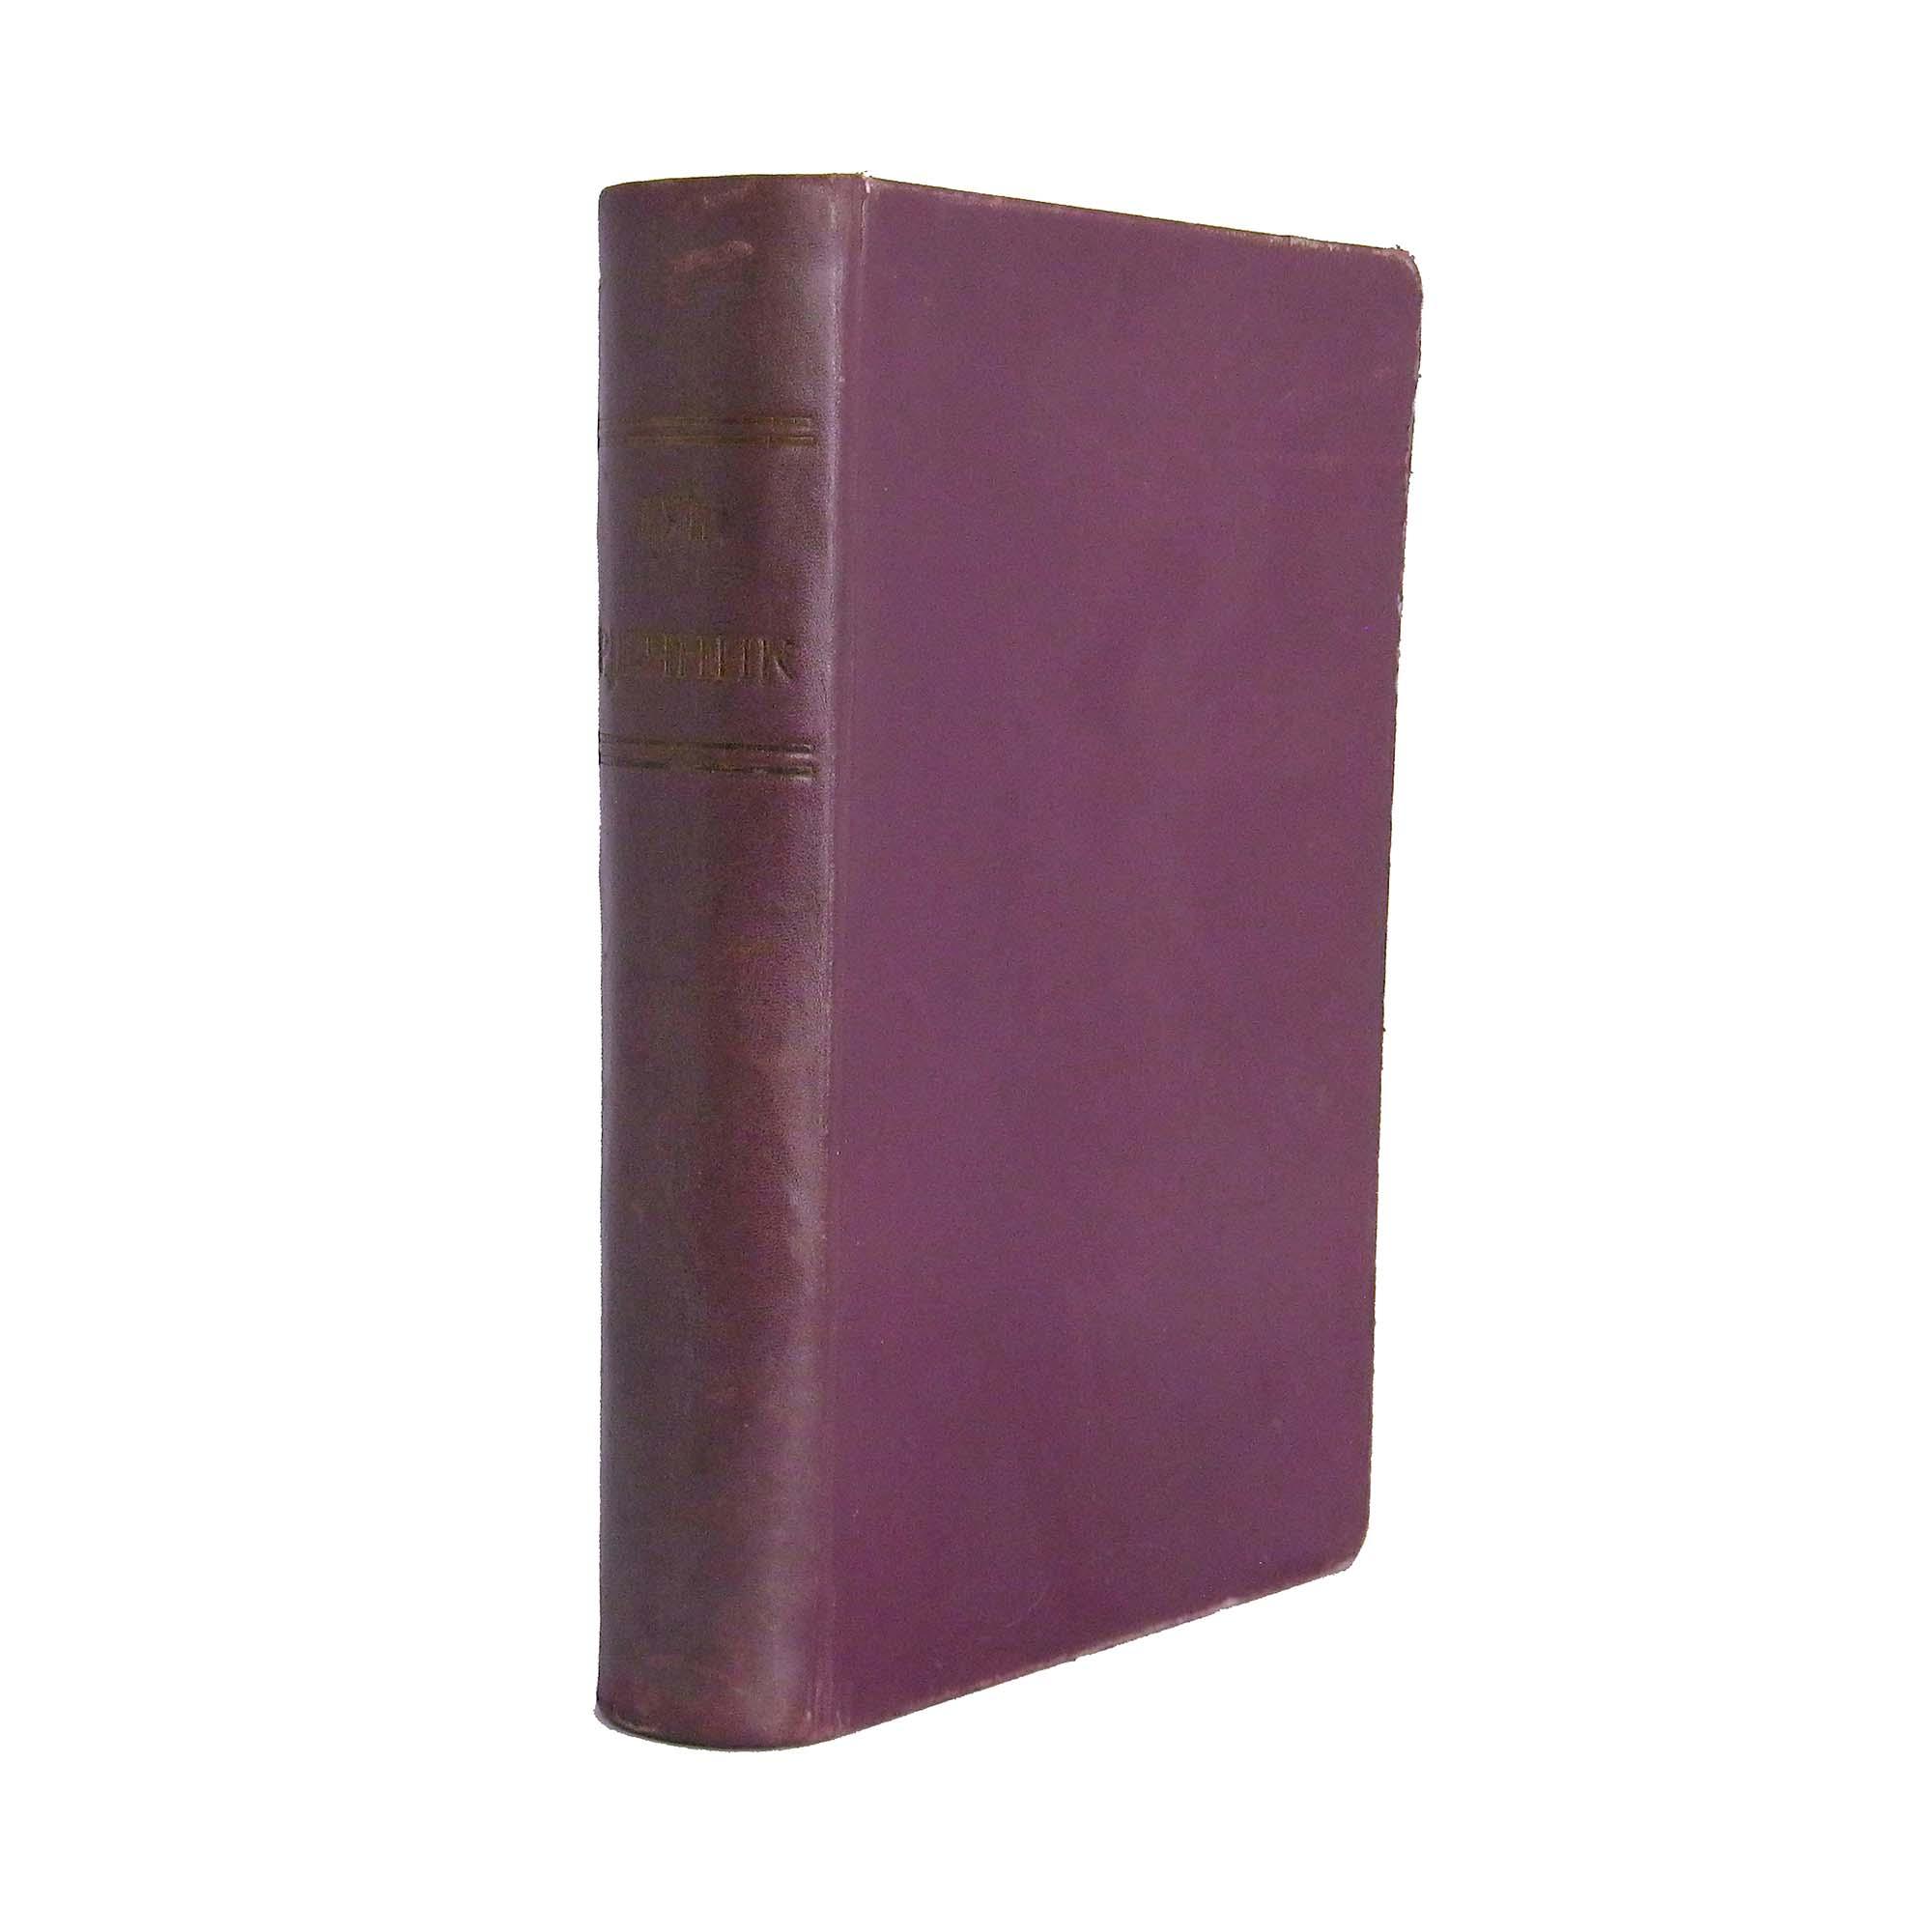 3041-Karadzic-Lexicon-Serbico-1898-Einband-frei-N.jpg